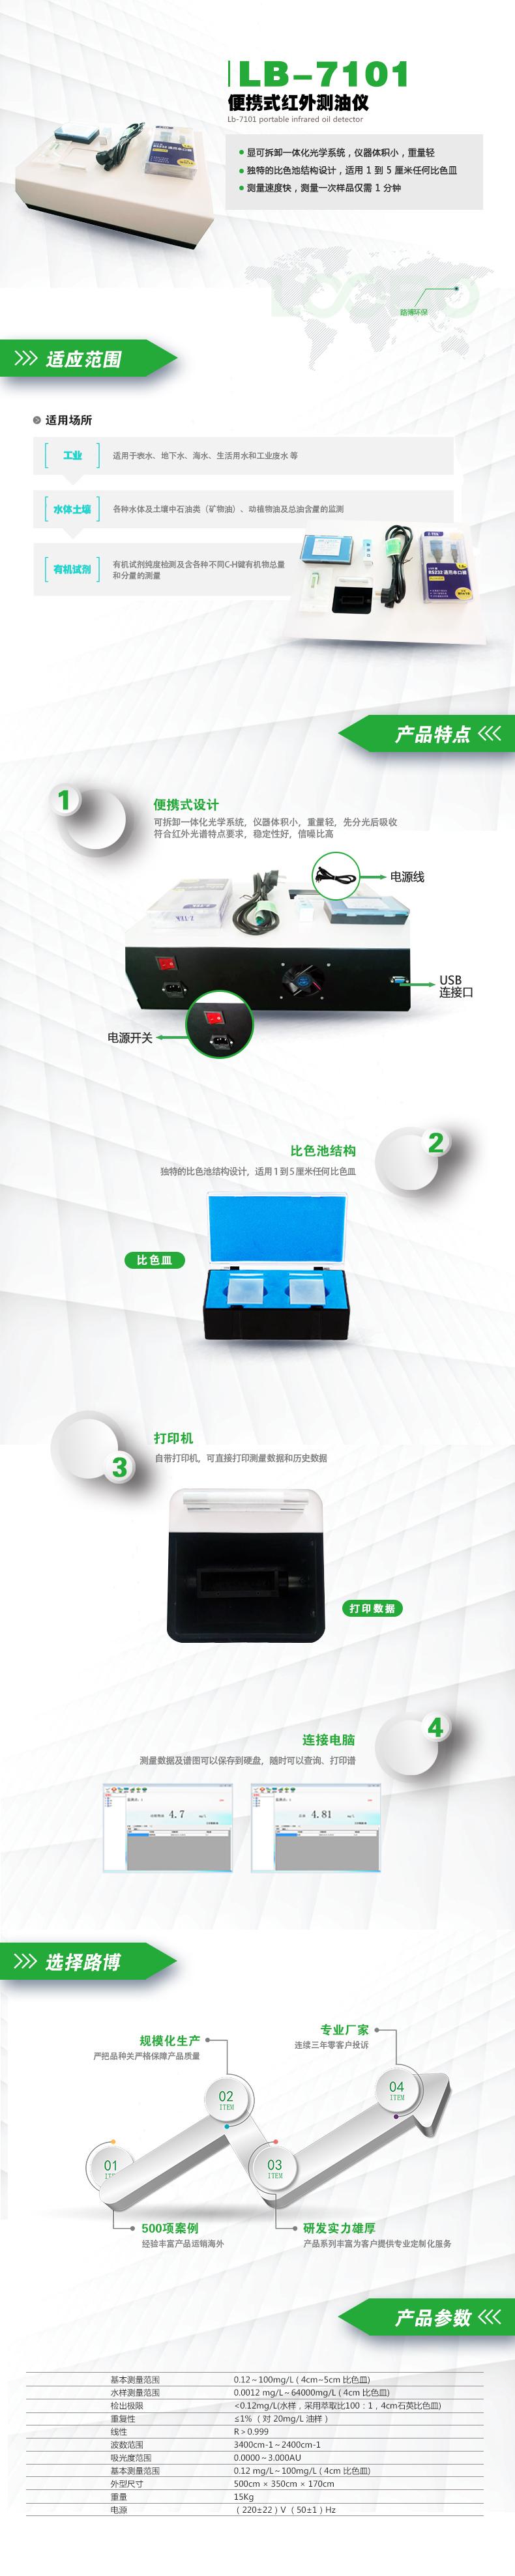 <strong>LB-7101便携式红外测油仪</strong>.jpg